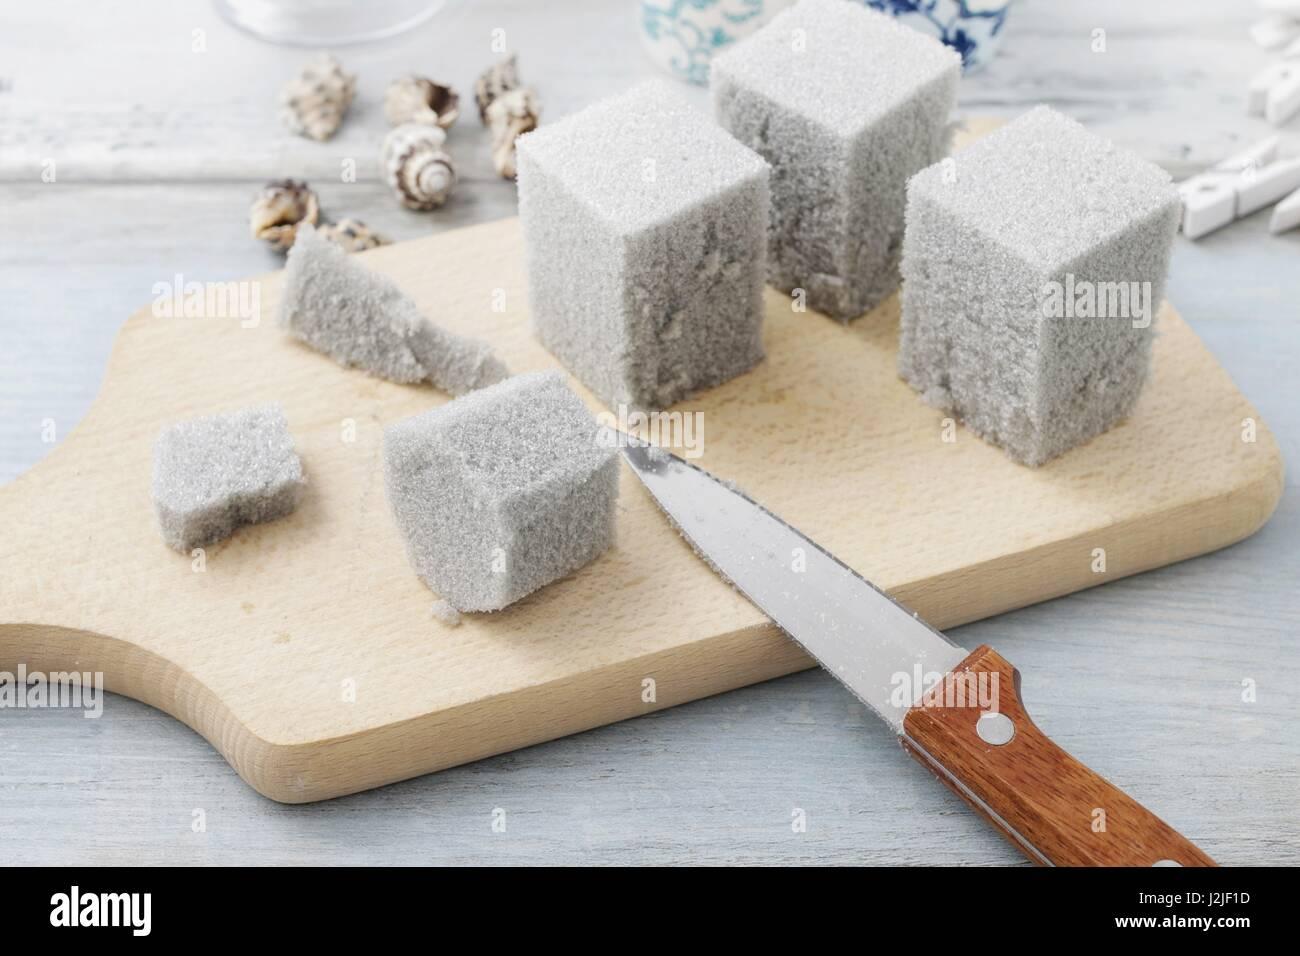 how to make ordinary cake